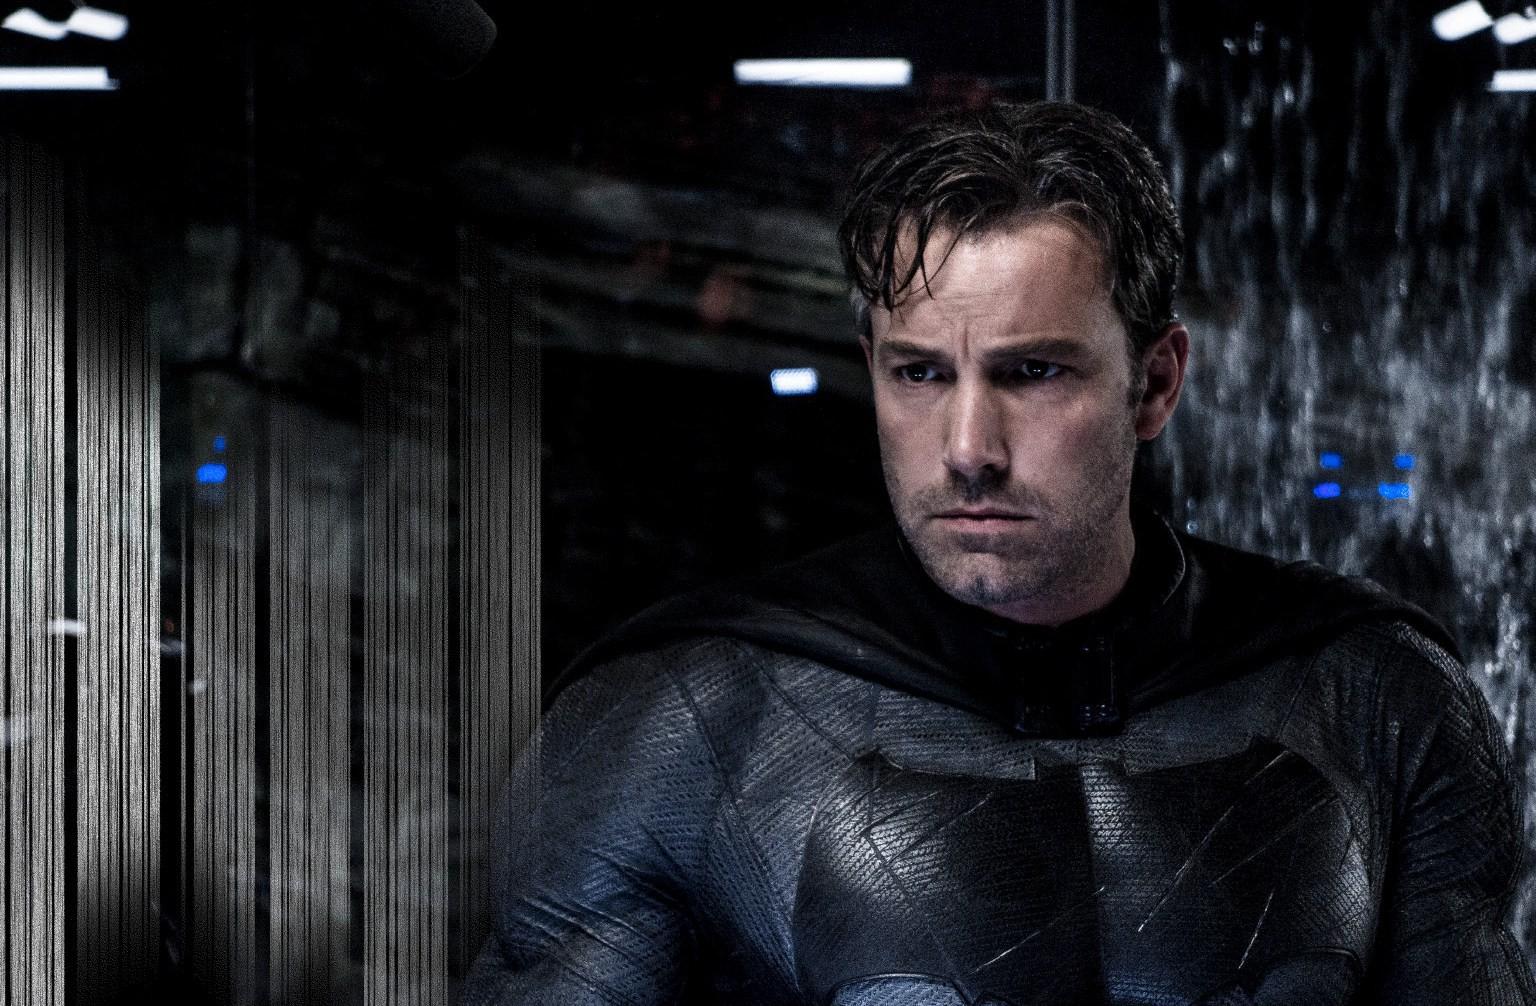 Variety назвал Роберта Паттинсона главным кандидатом на роль Бэтмена